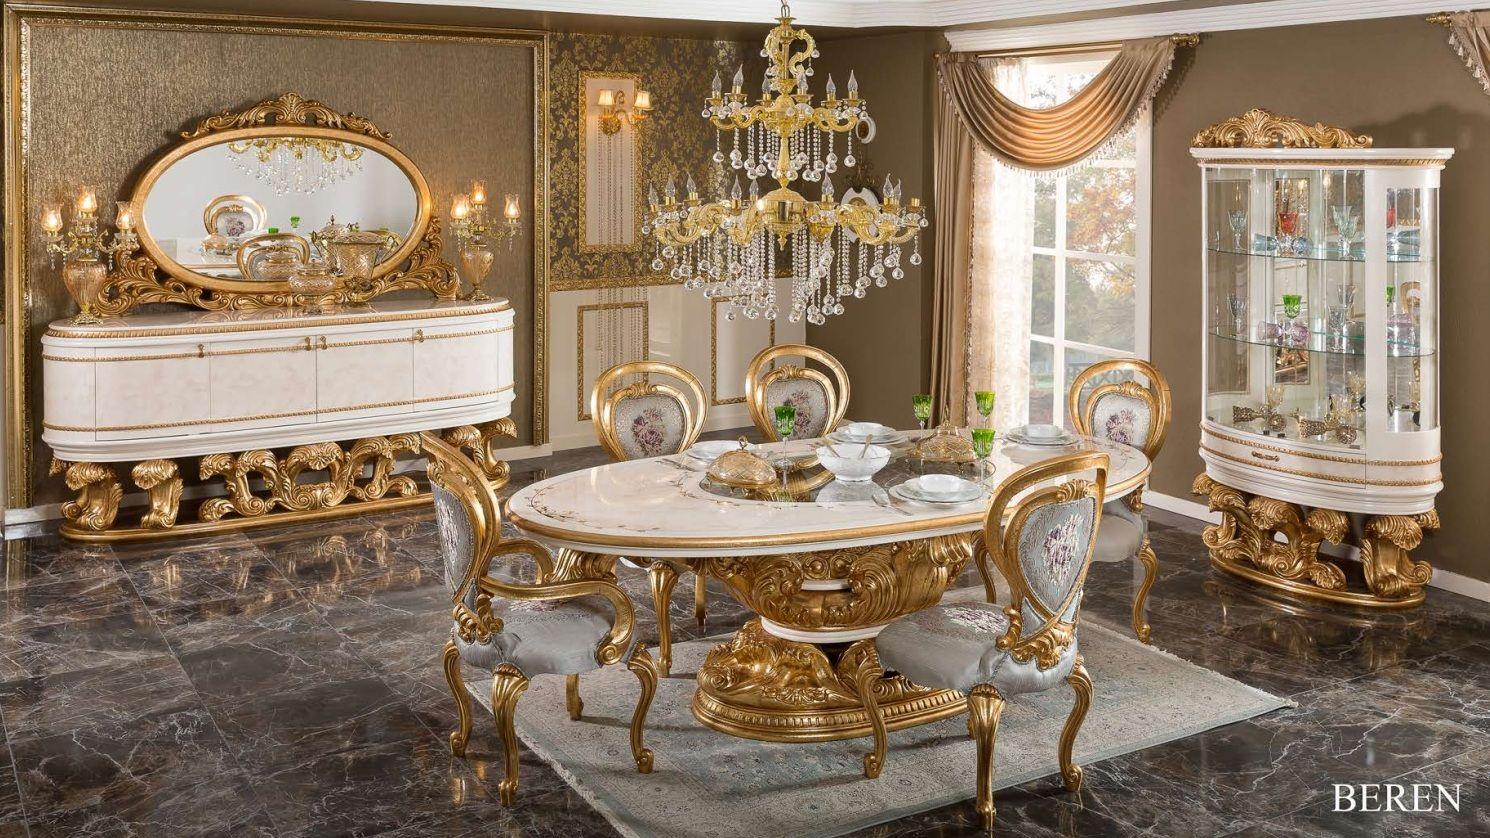 Luxuryfurniture Home Ciekawostki